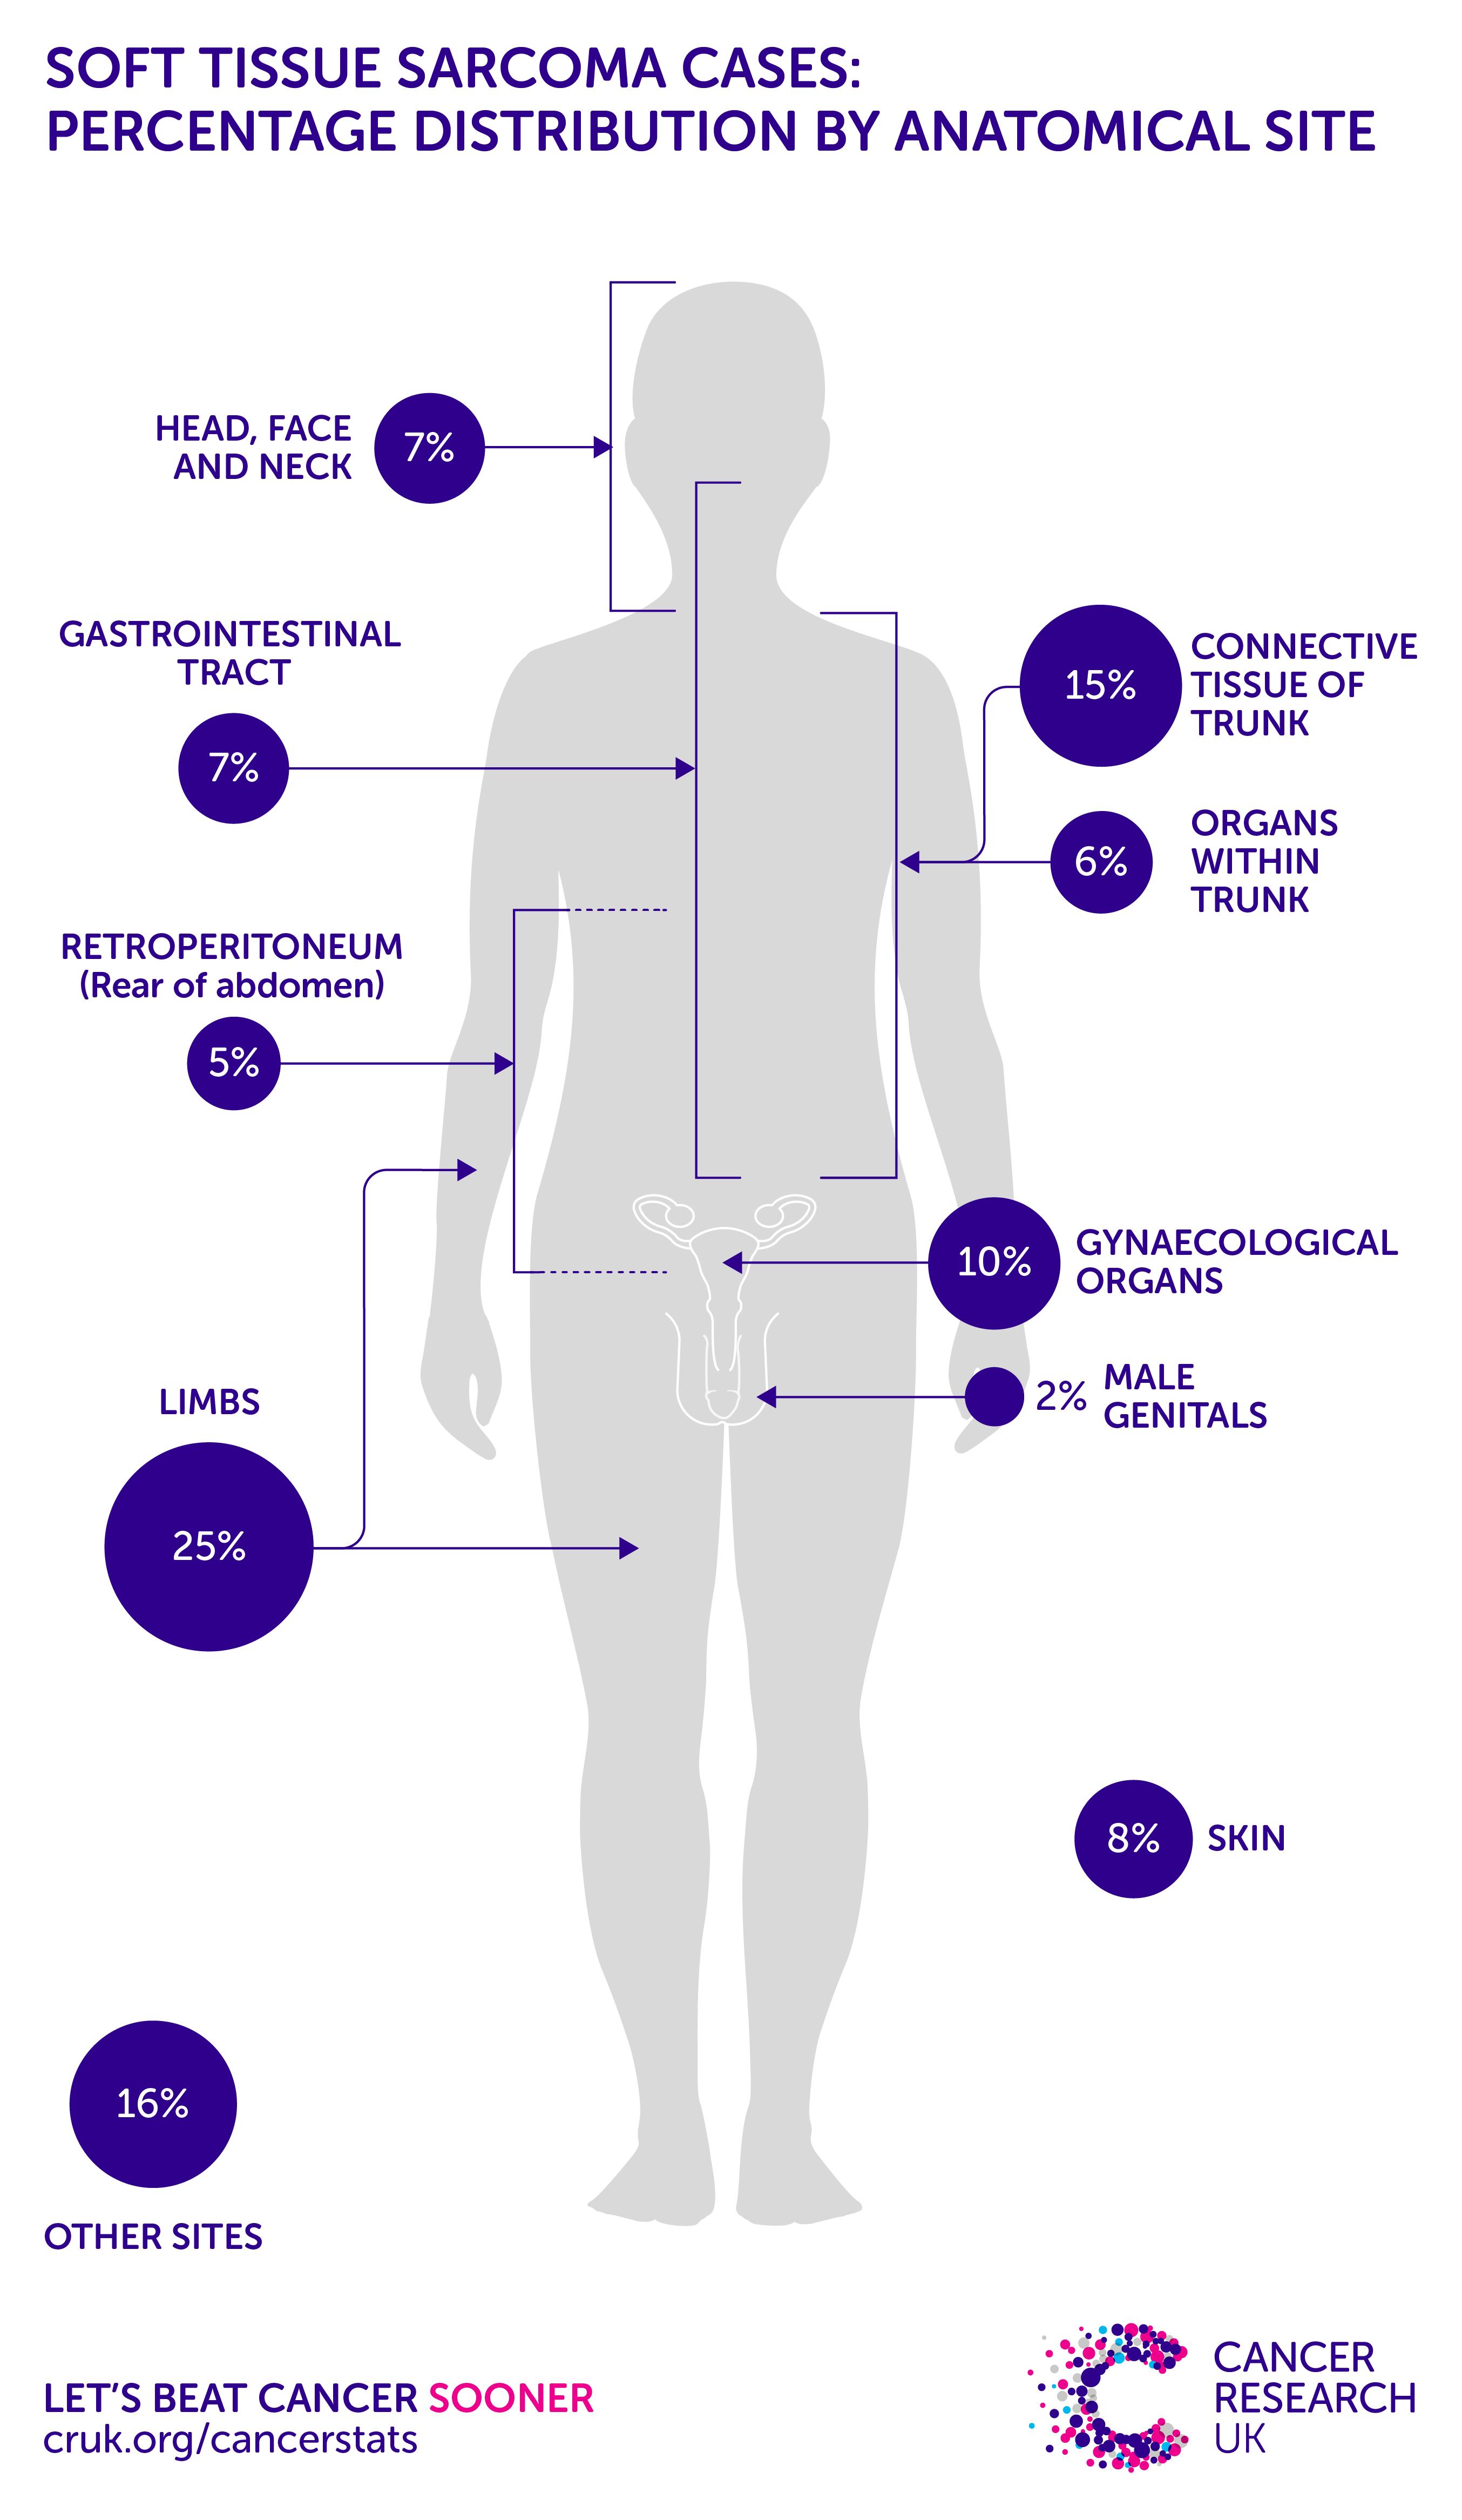 sarcoma cancer soft tissue din ce negi genitale apar la femei